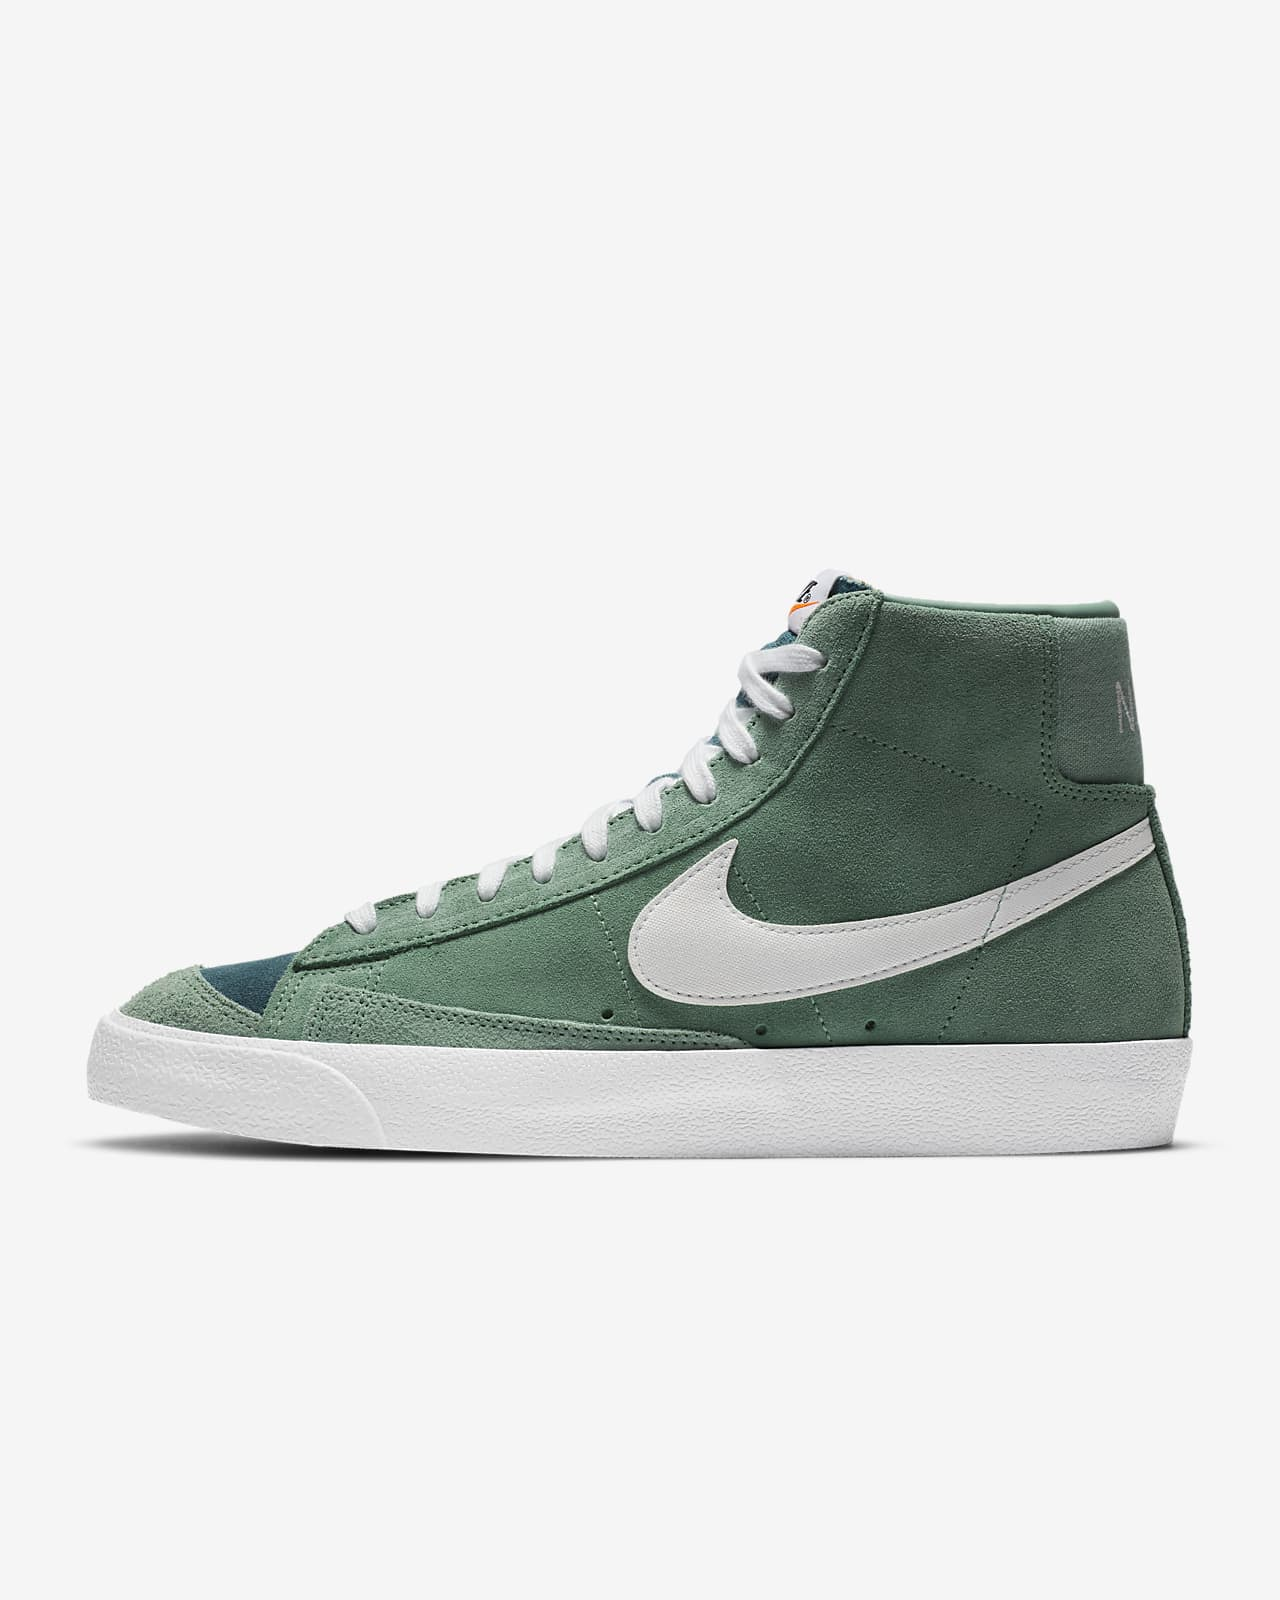 Chaussure Nike Blazer '77 Vintage pour Homme